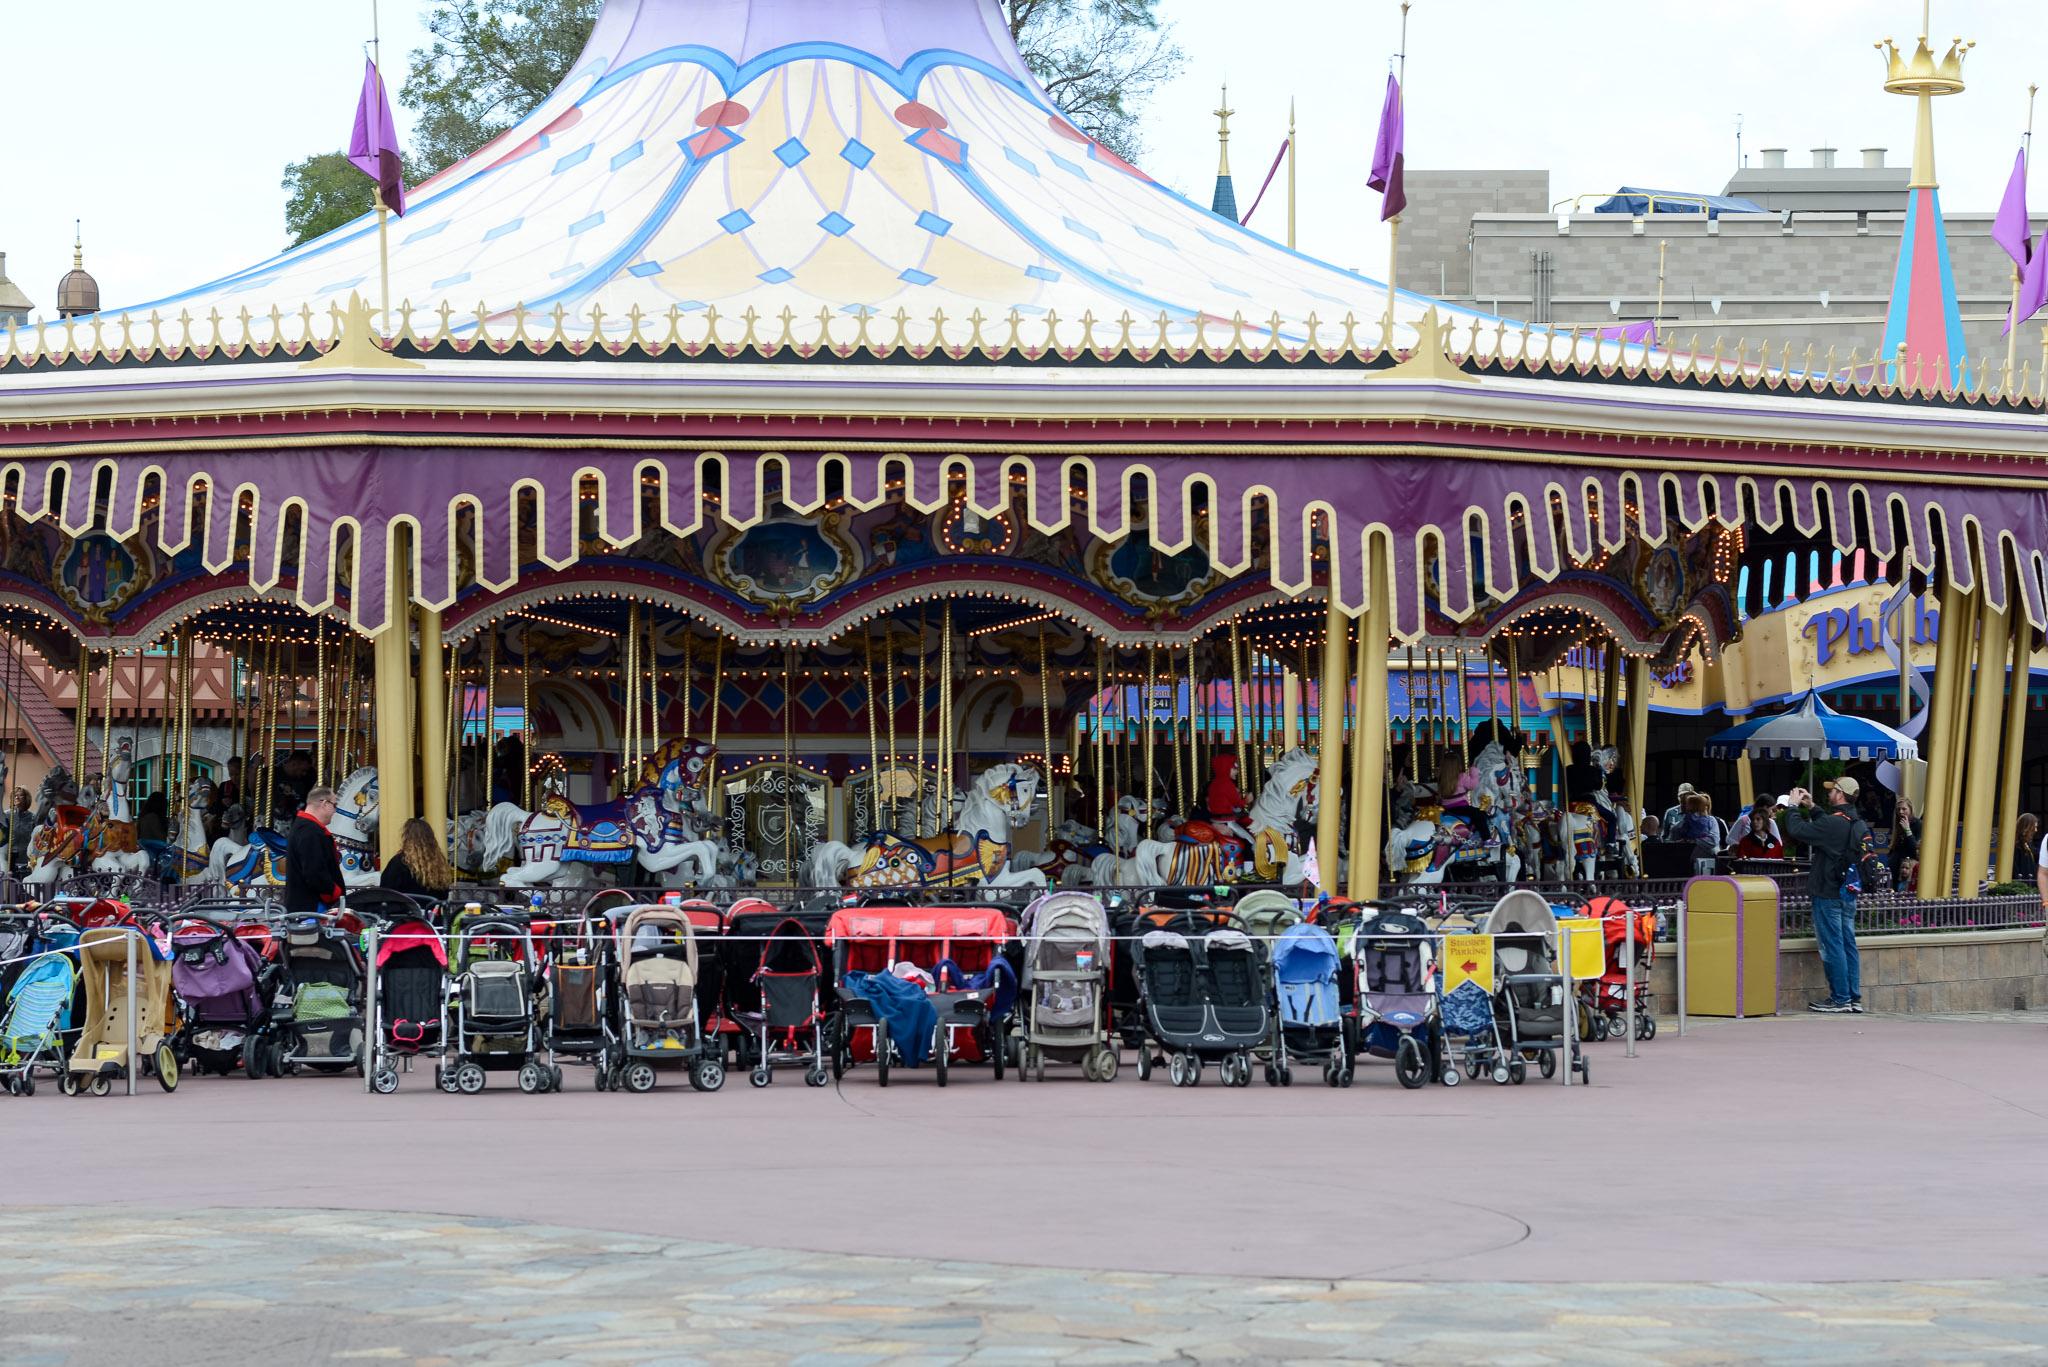 Carrousel - Walt Disney World Magic Kingdom